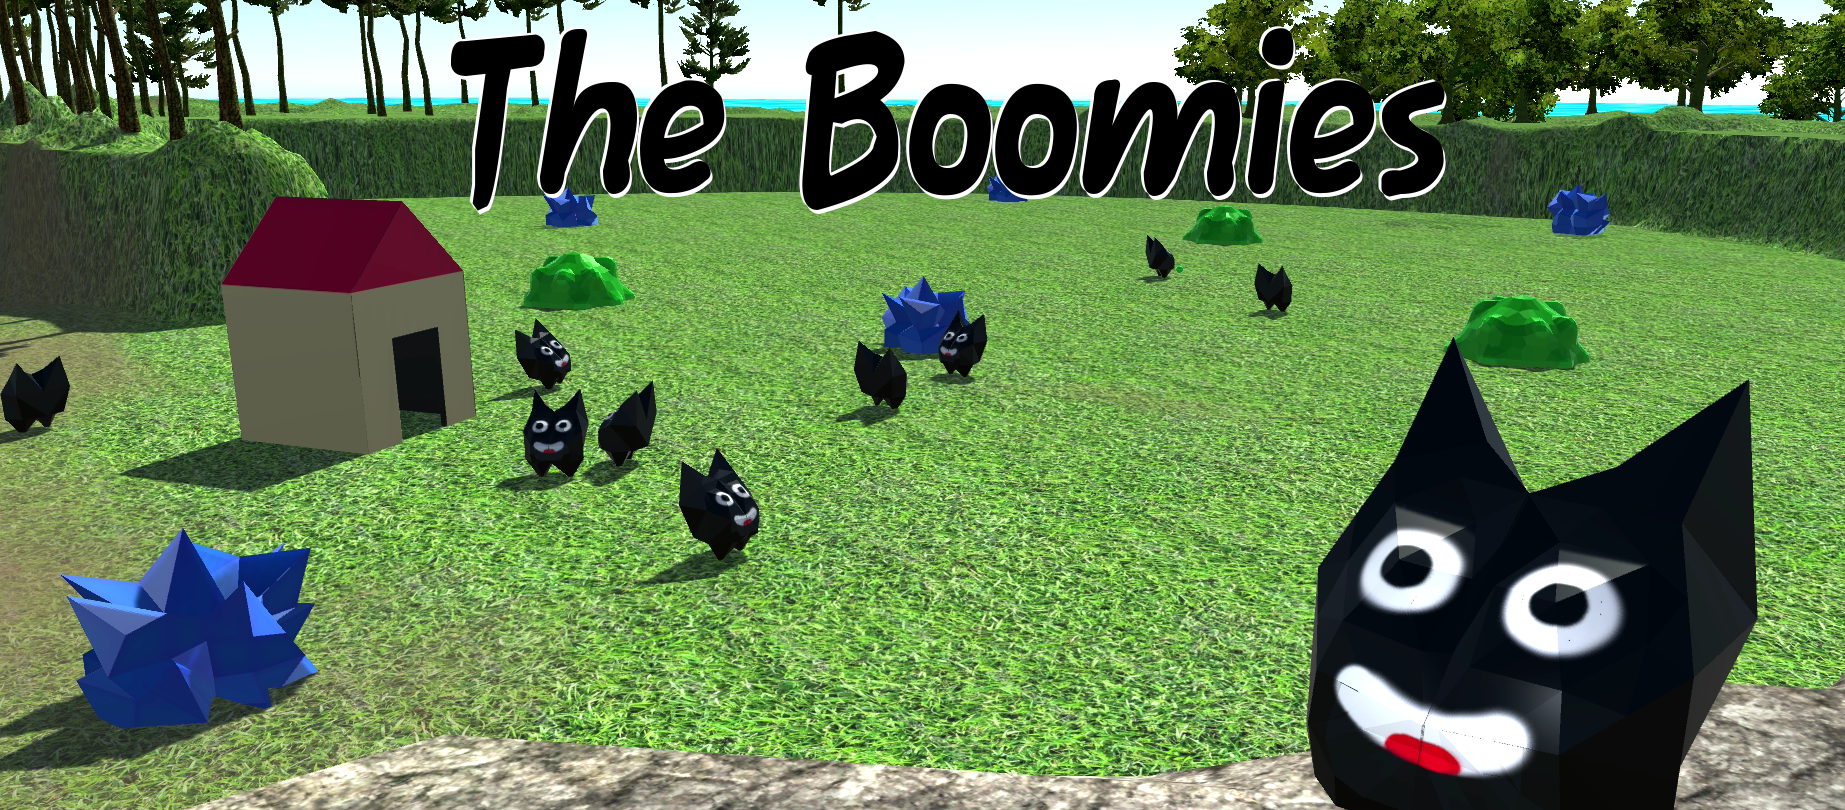 The Boomies